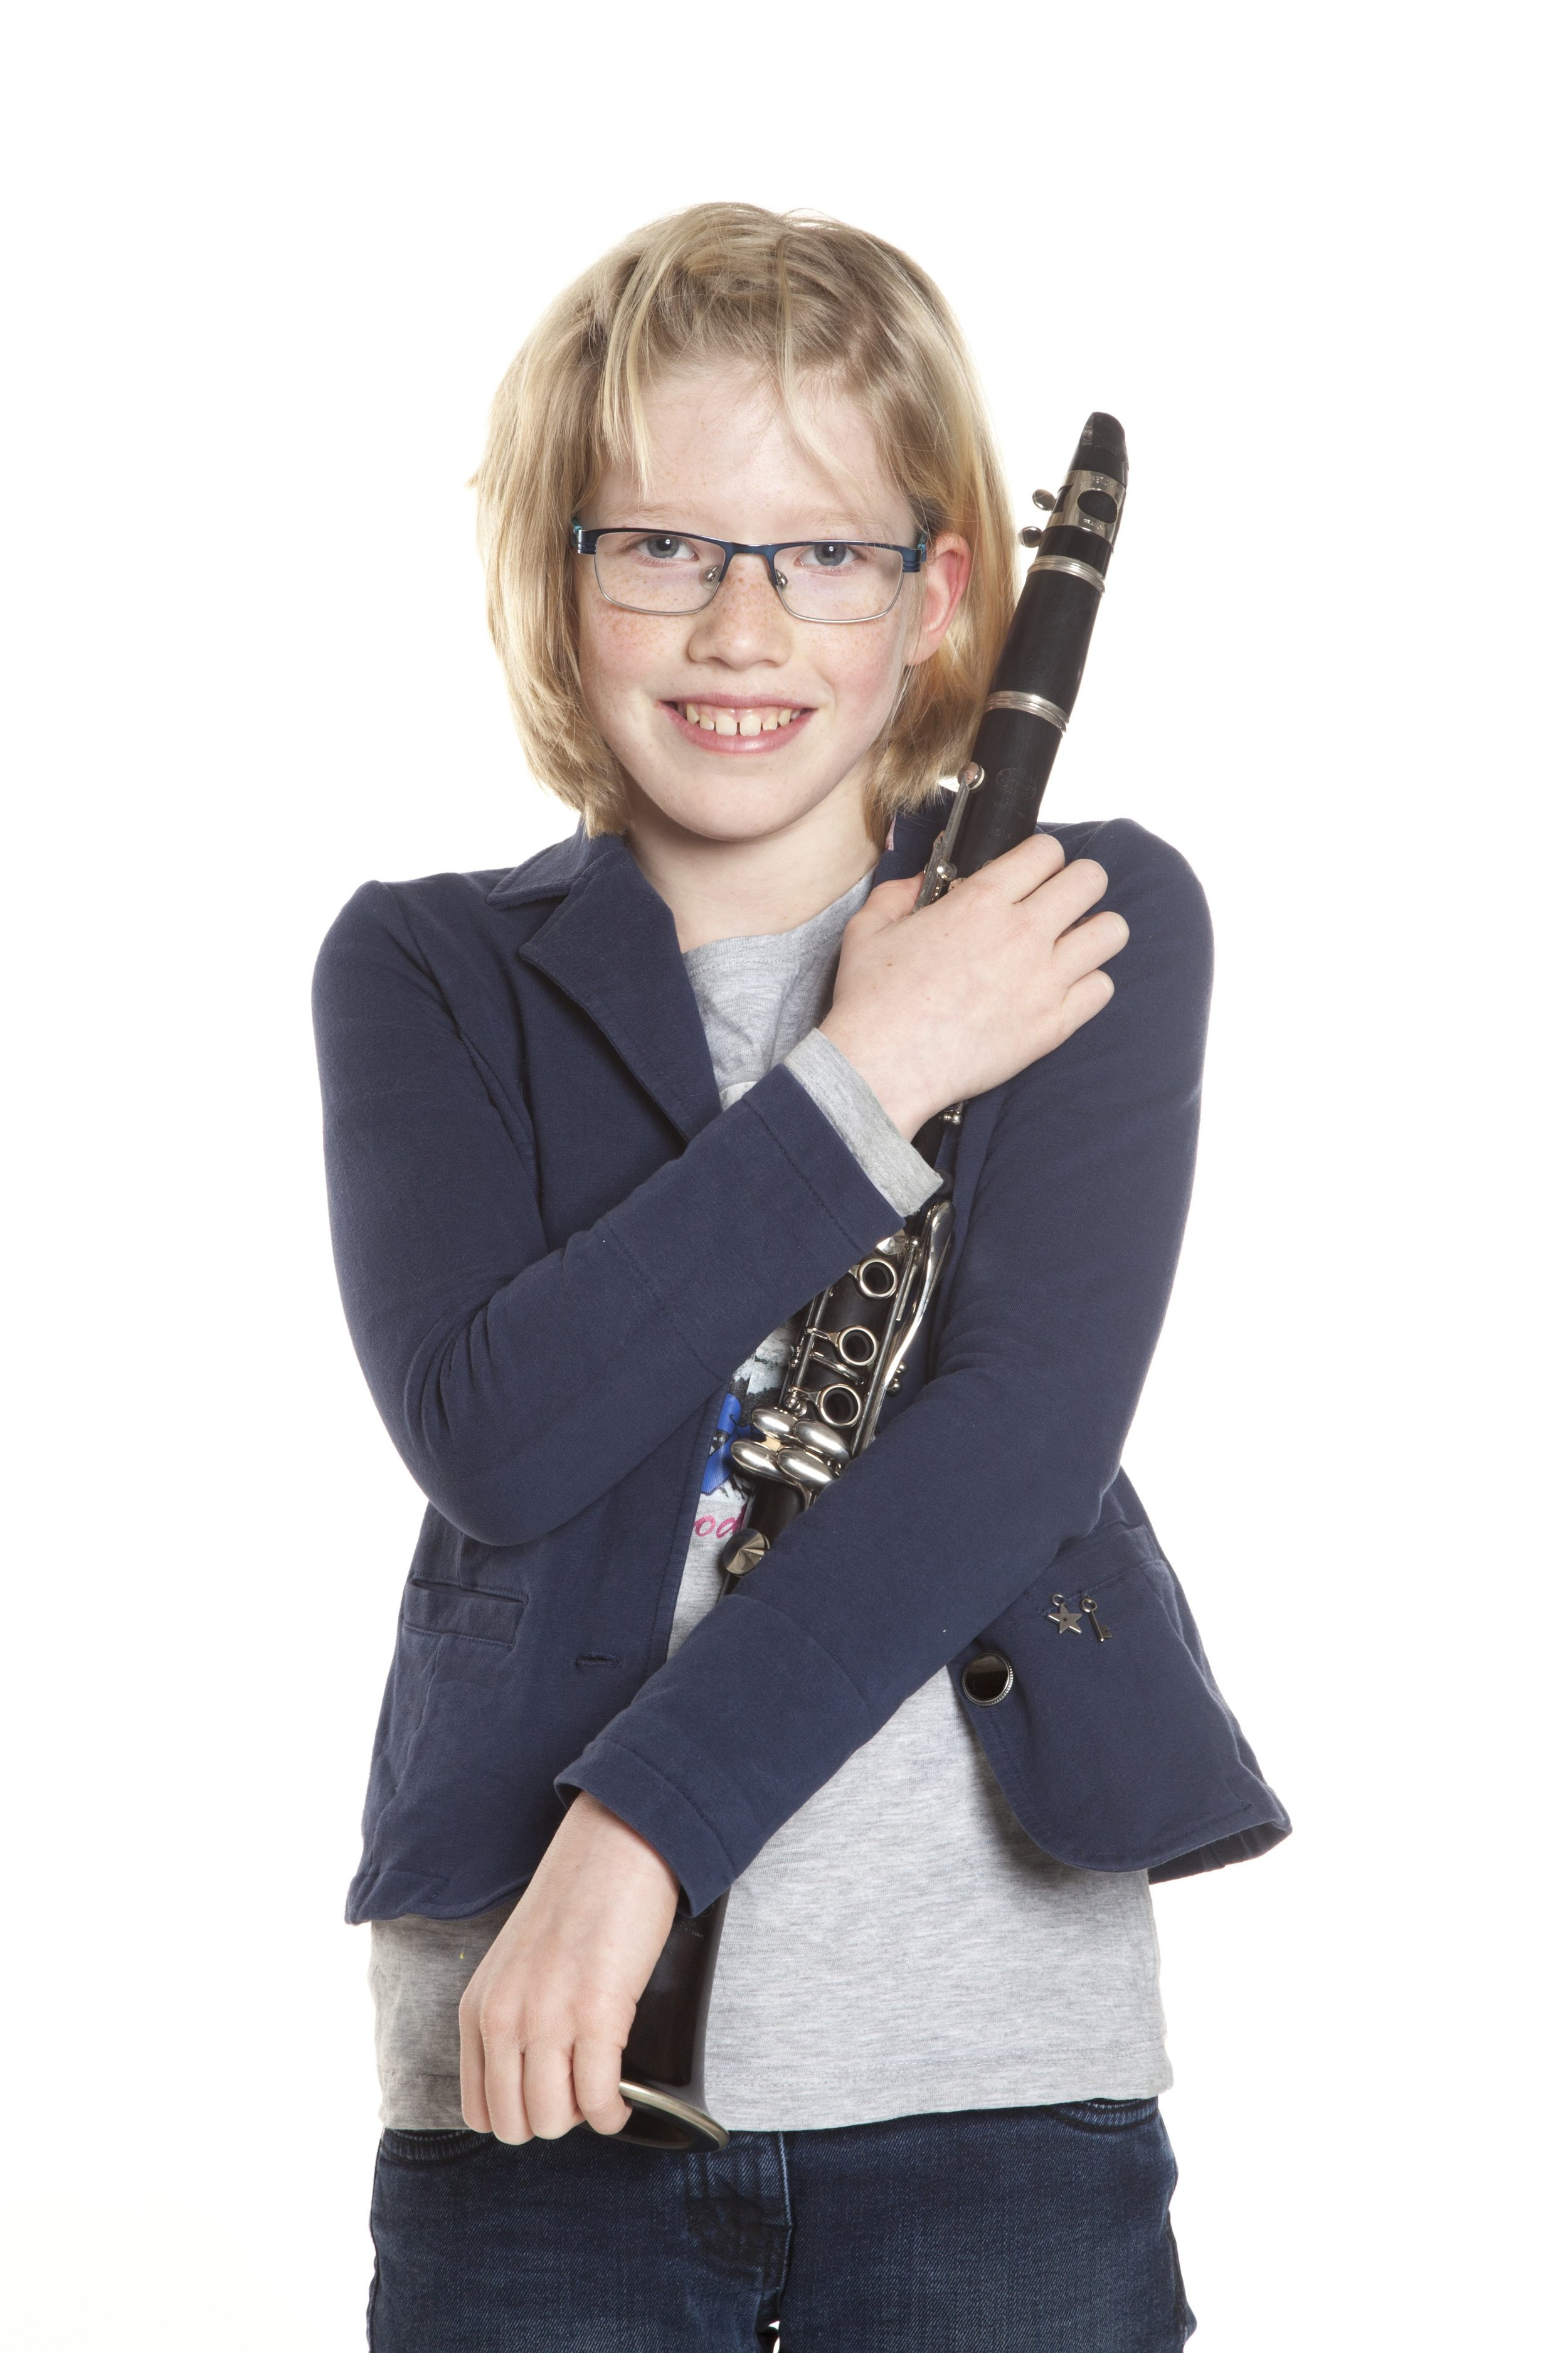 Clarinet Girl.jpg